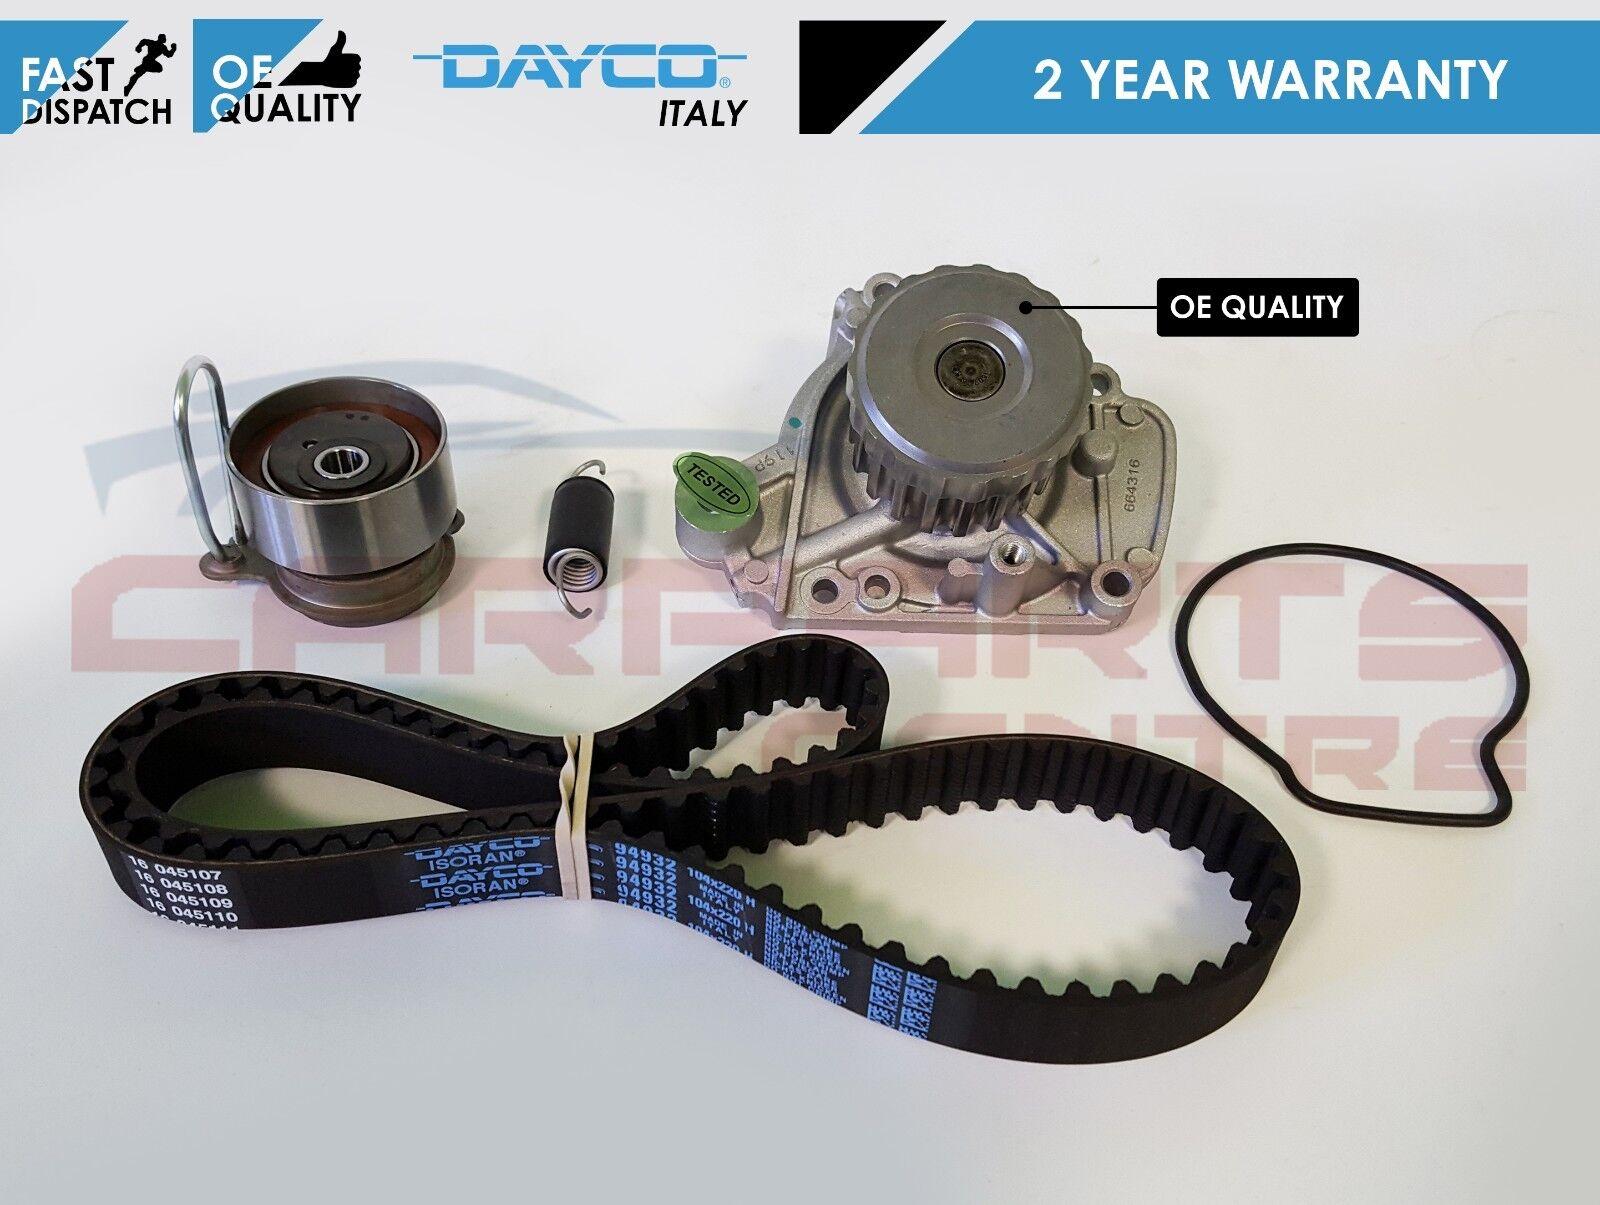 For Honda Stream Frv 17 16v Civic 16 Dayco Cam Timing Belt Kit Water Pump